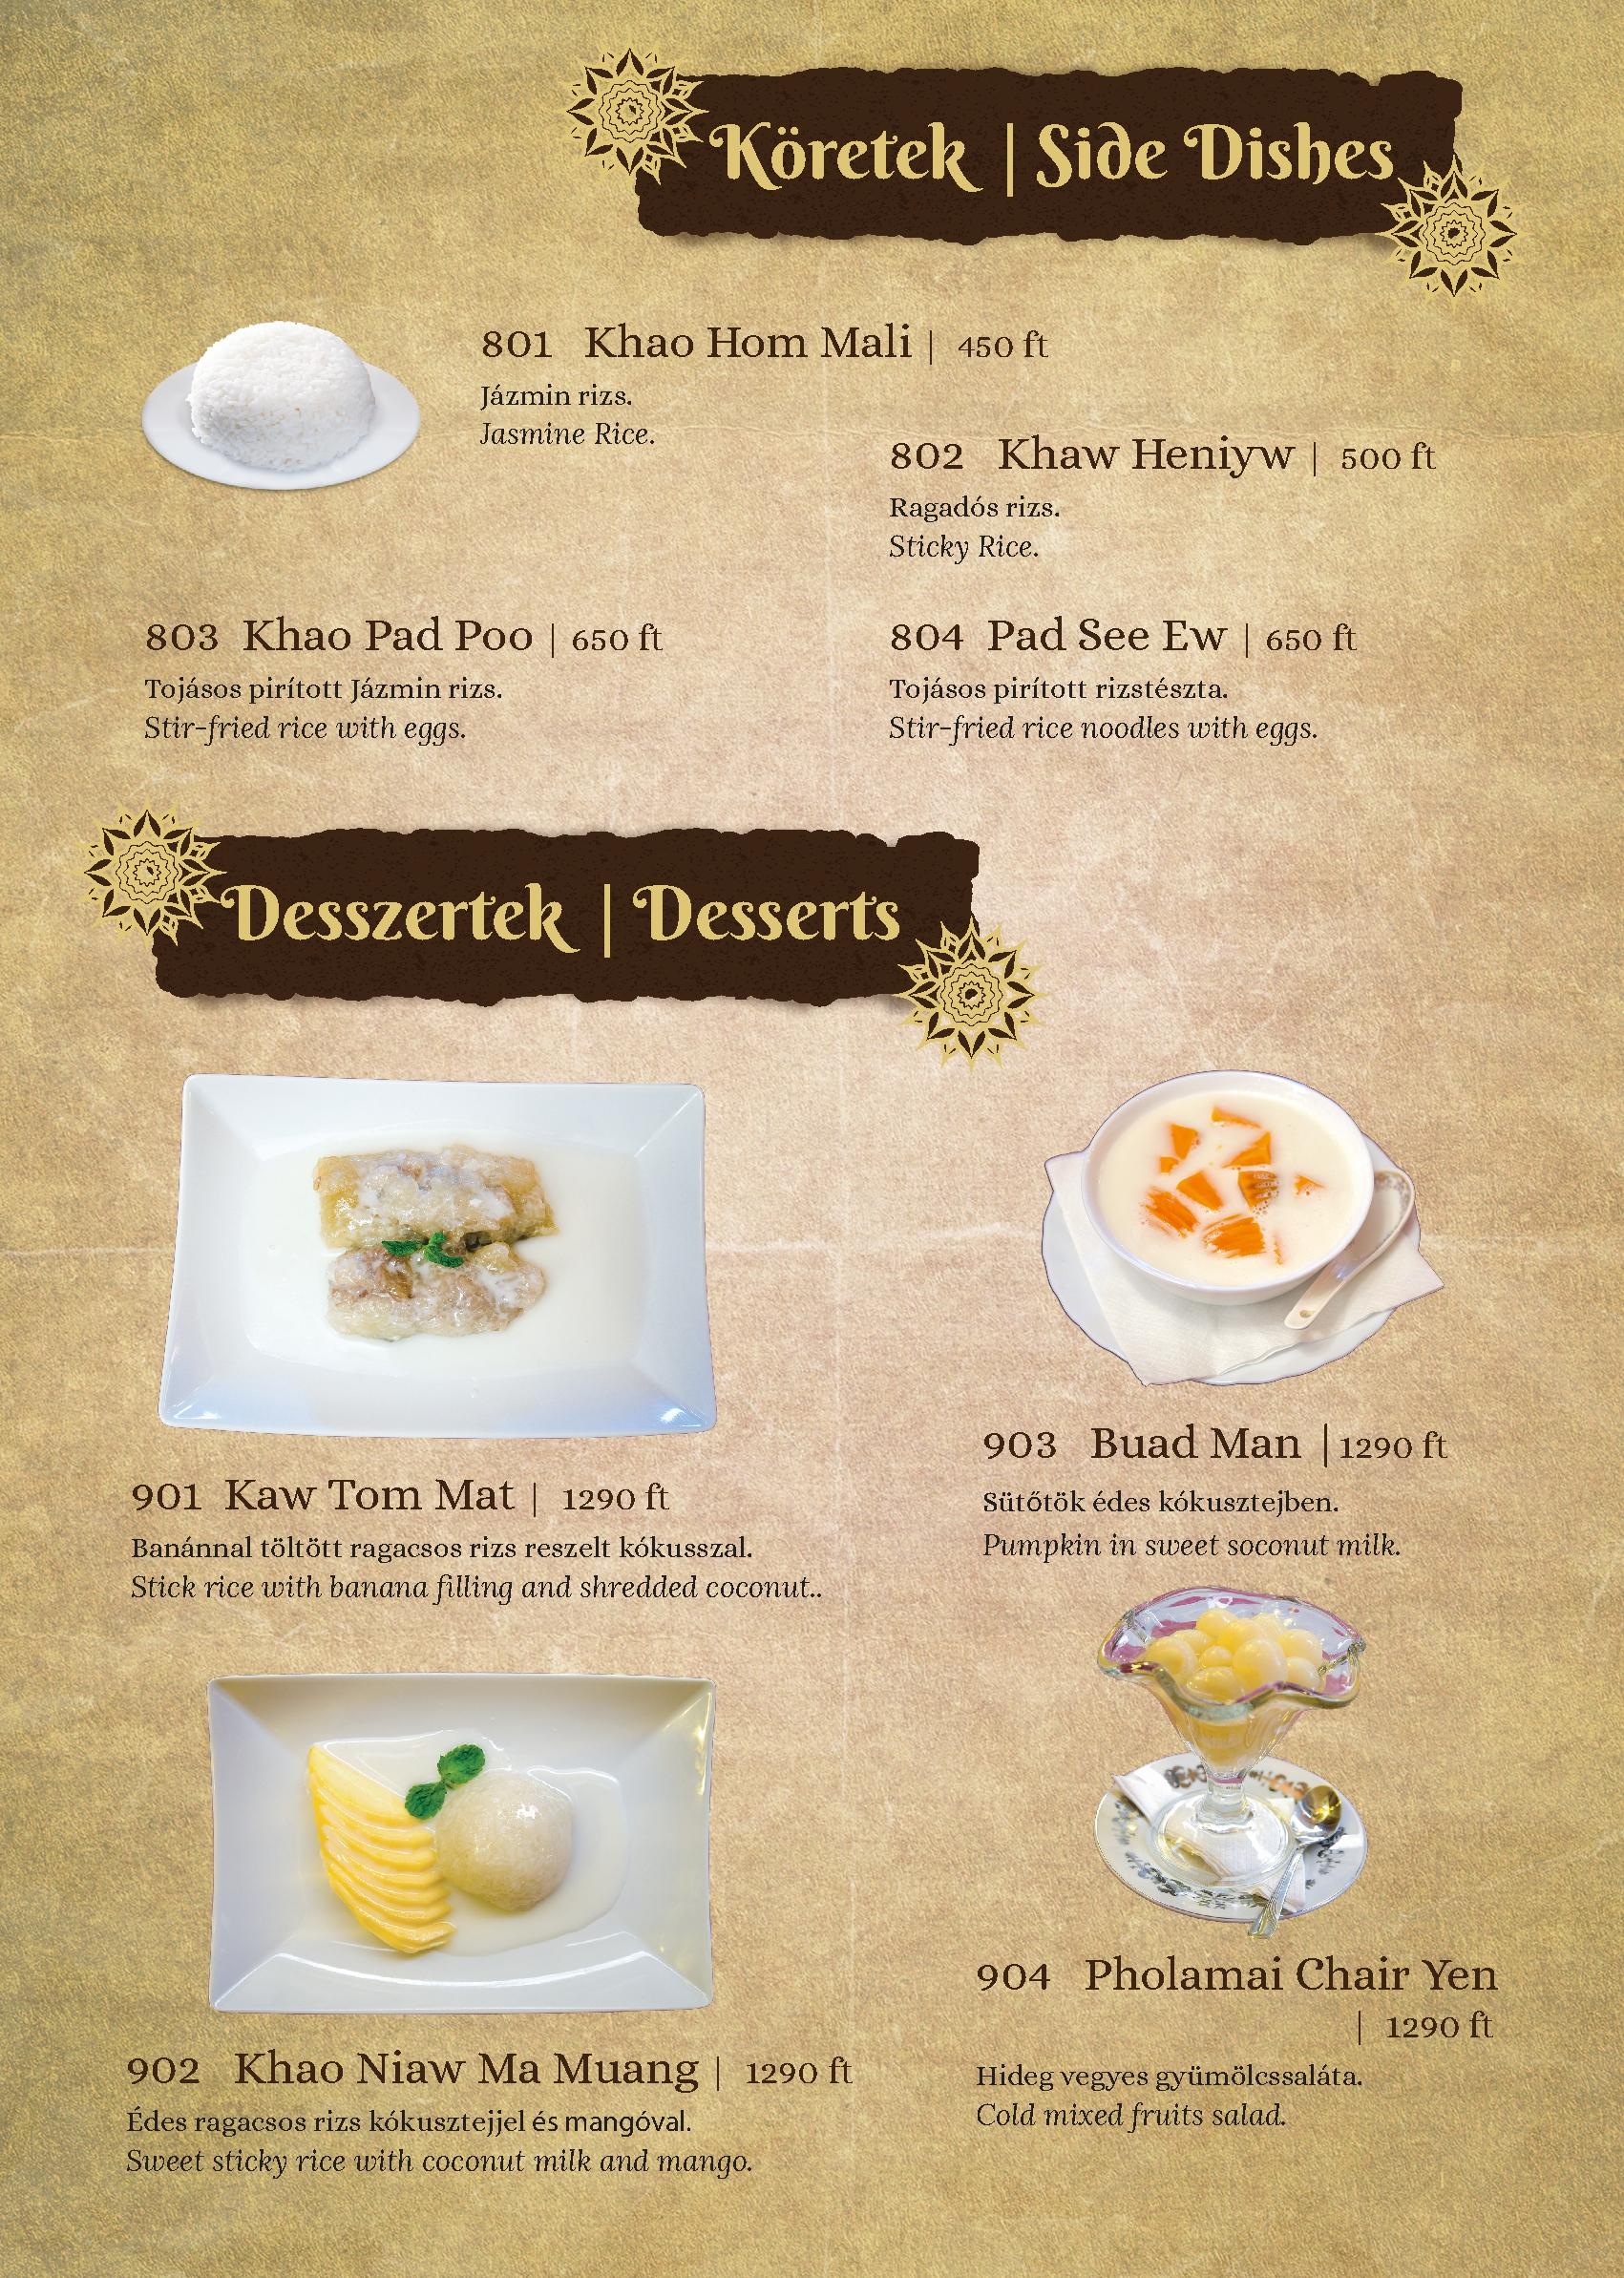 8.Sawasdee_menu_book-Side_dish_&_Dessert.0915.1.jpg